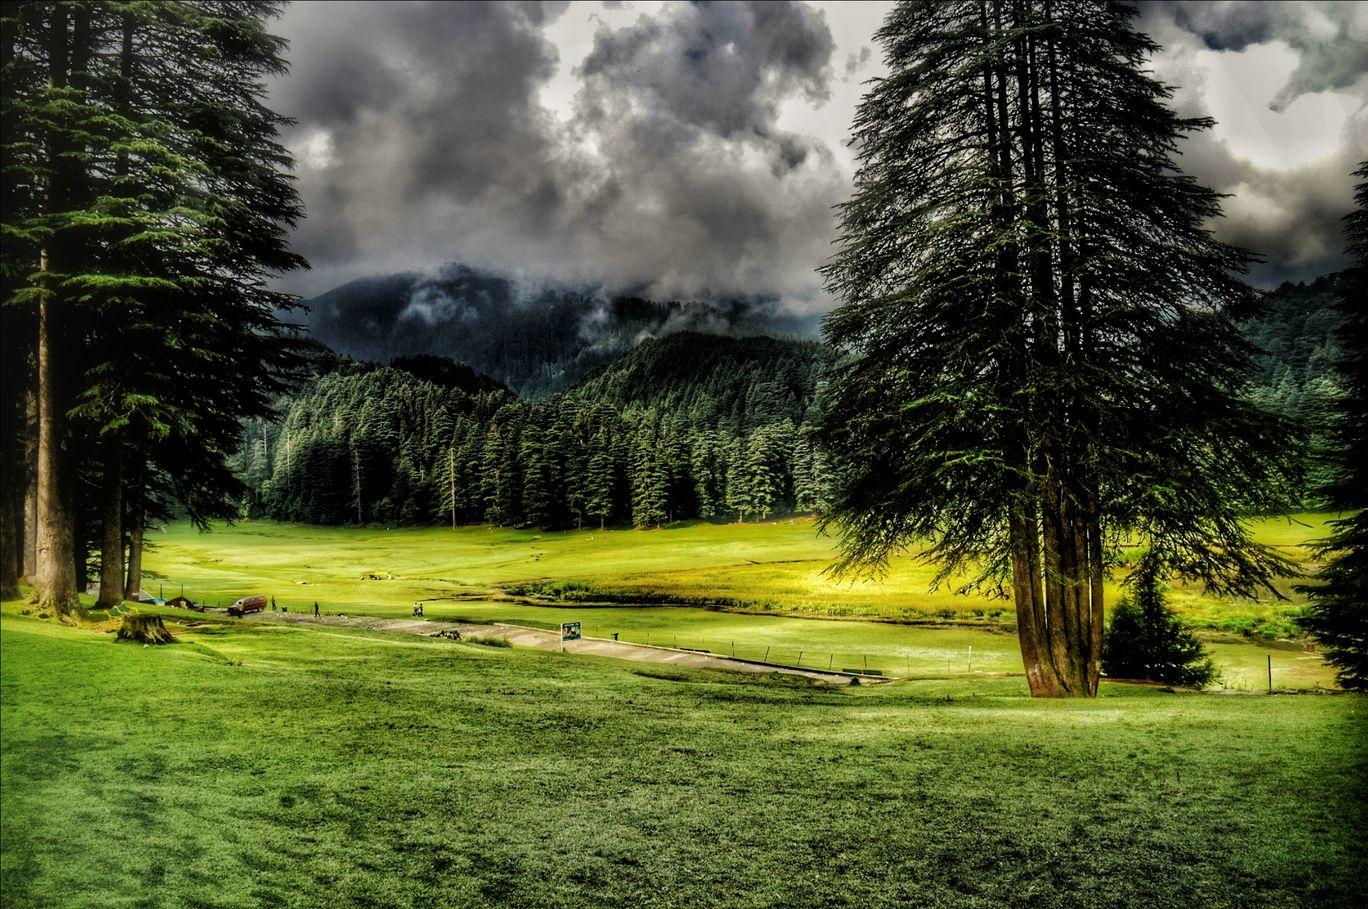 Photo of Khajjiar By Arpit Madaan